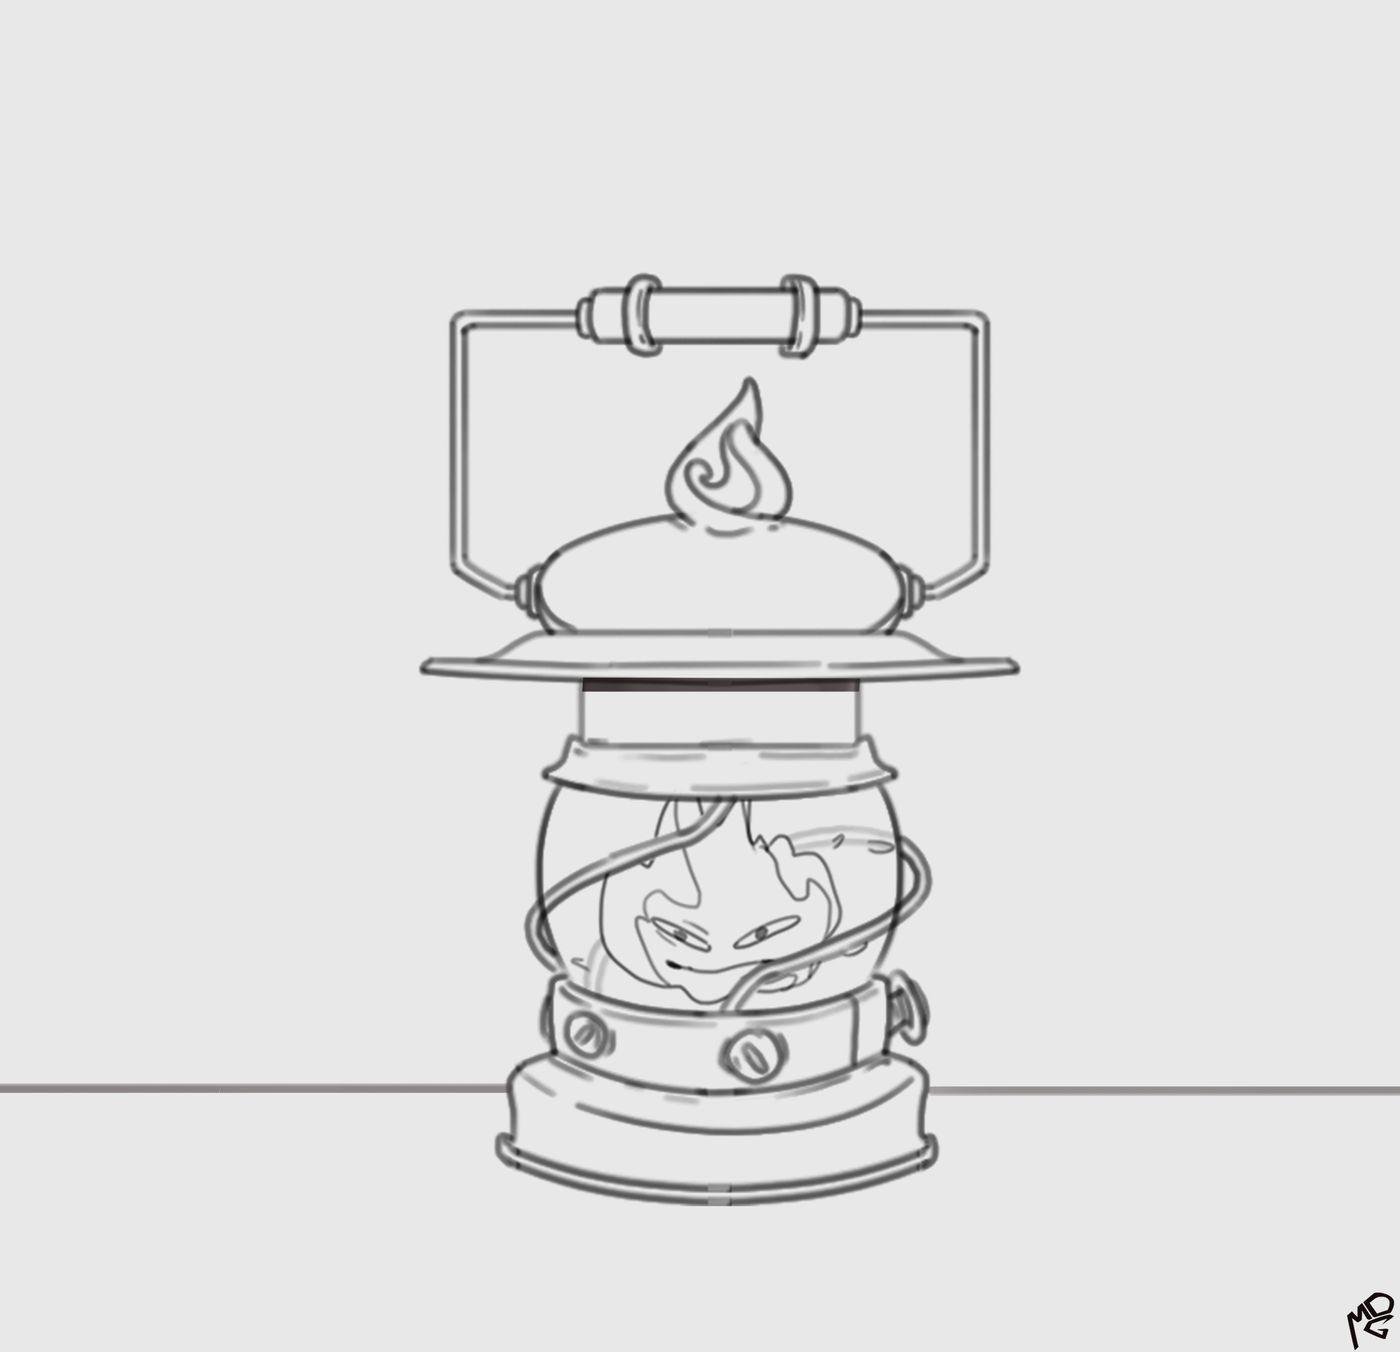 Lampe001 Nicomdg